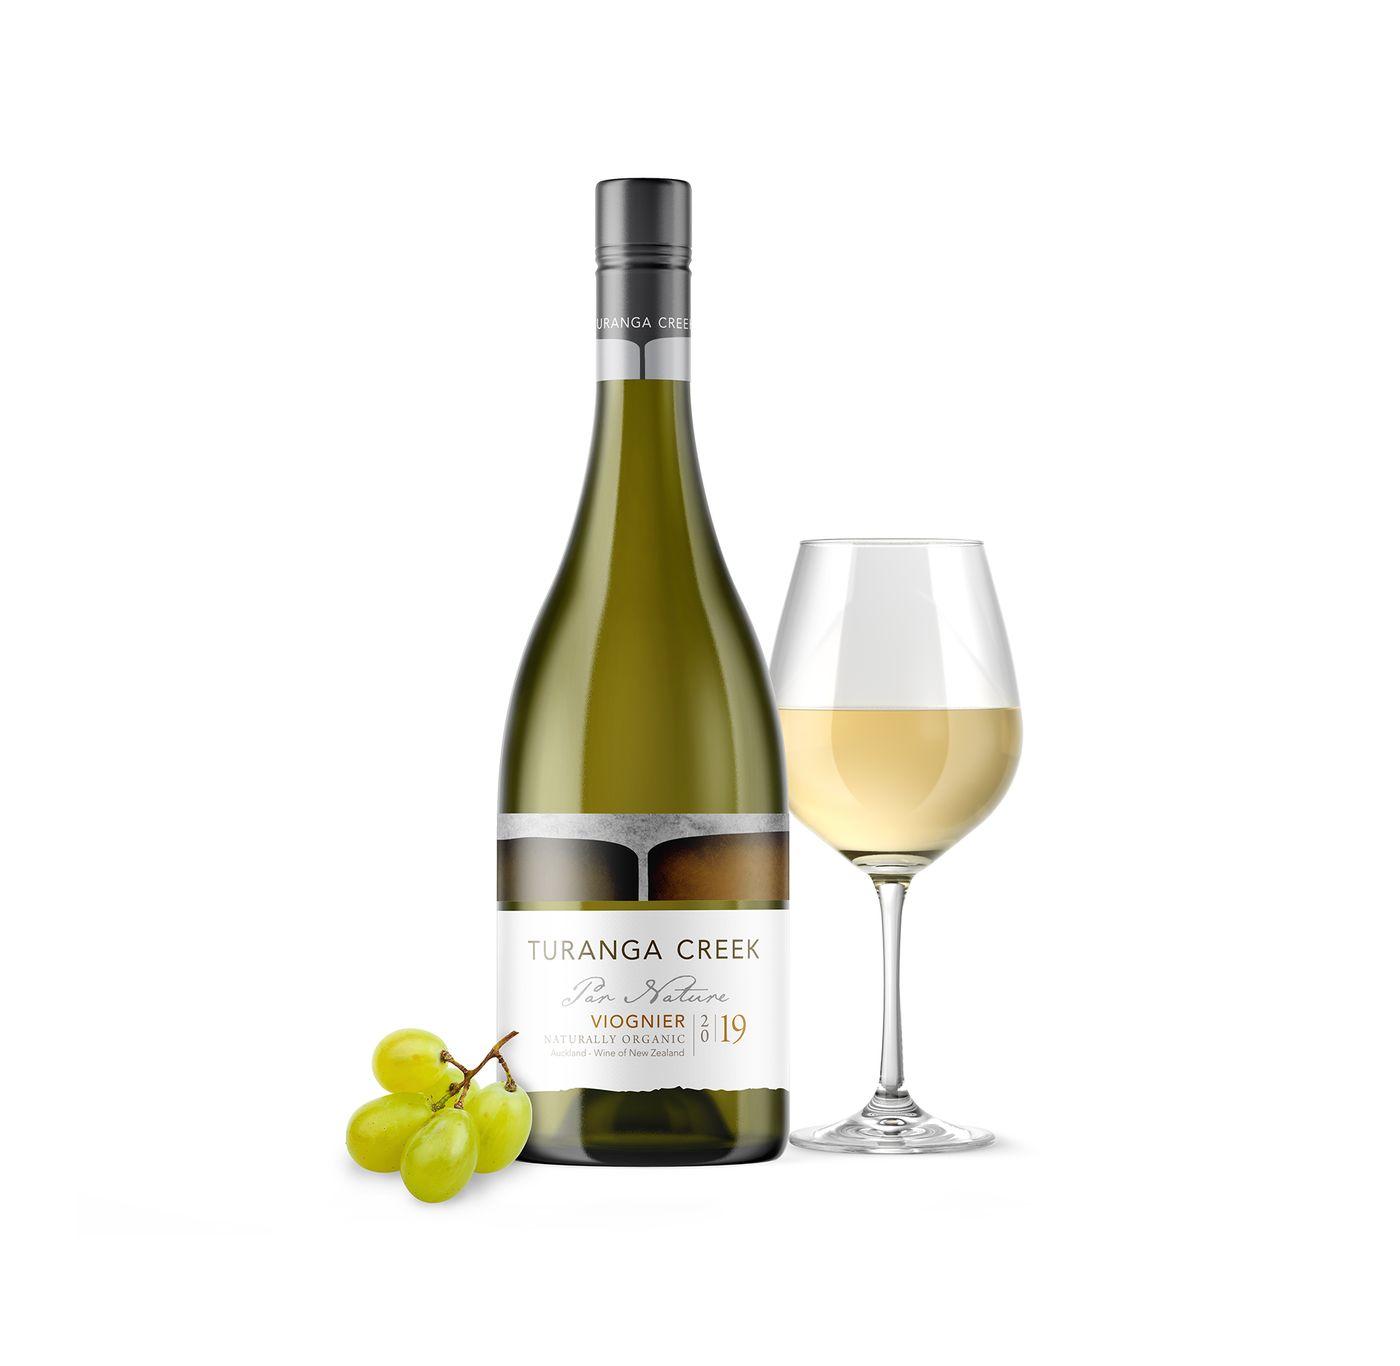 Turanga Creek Wine Reserve Viognier